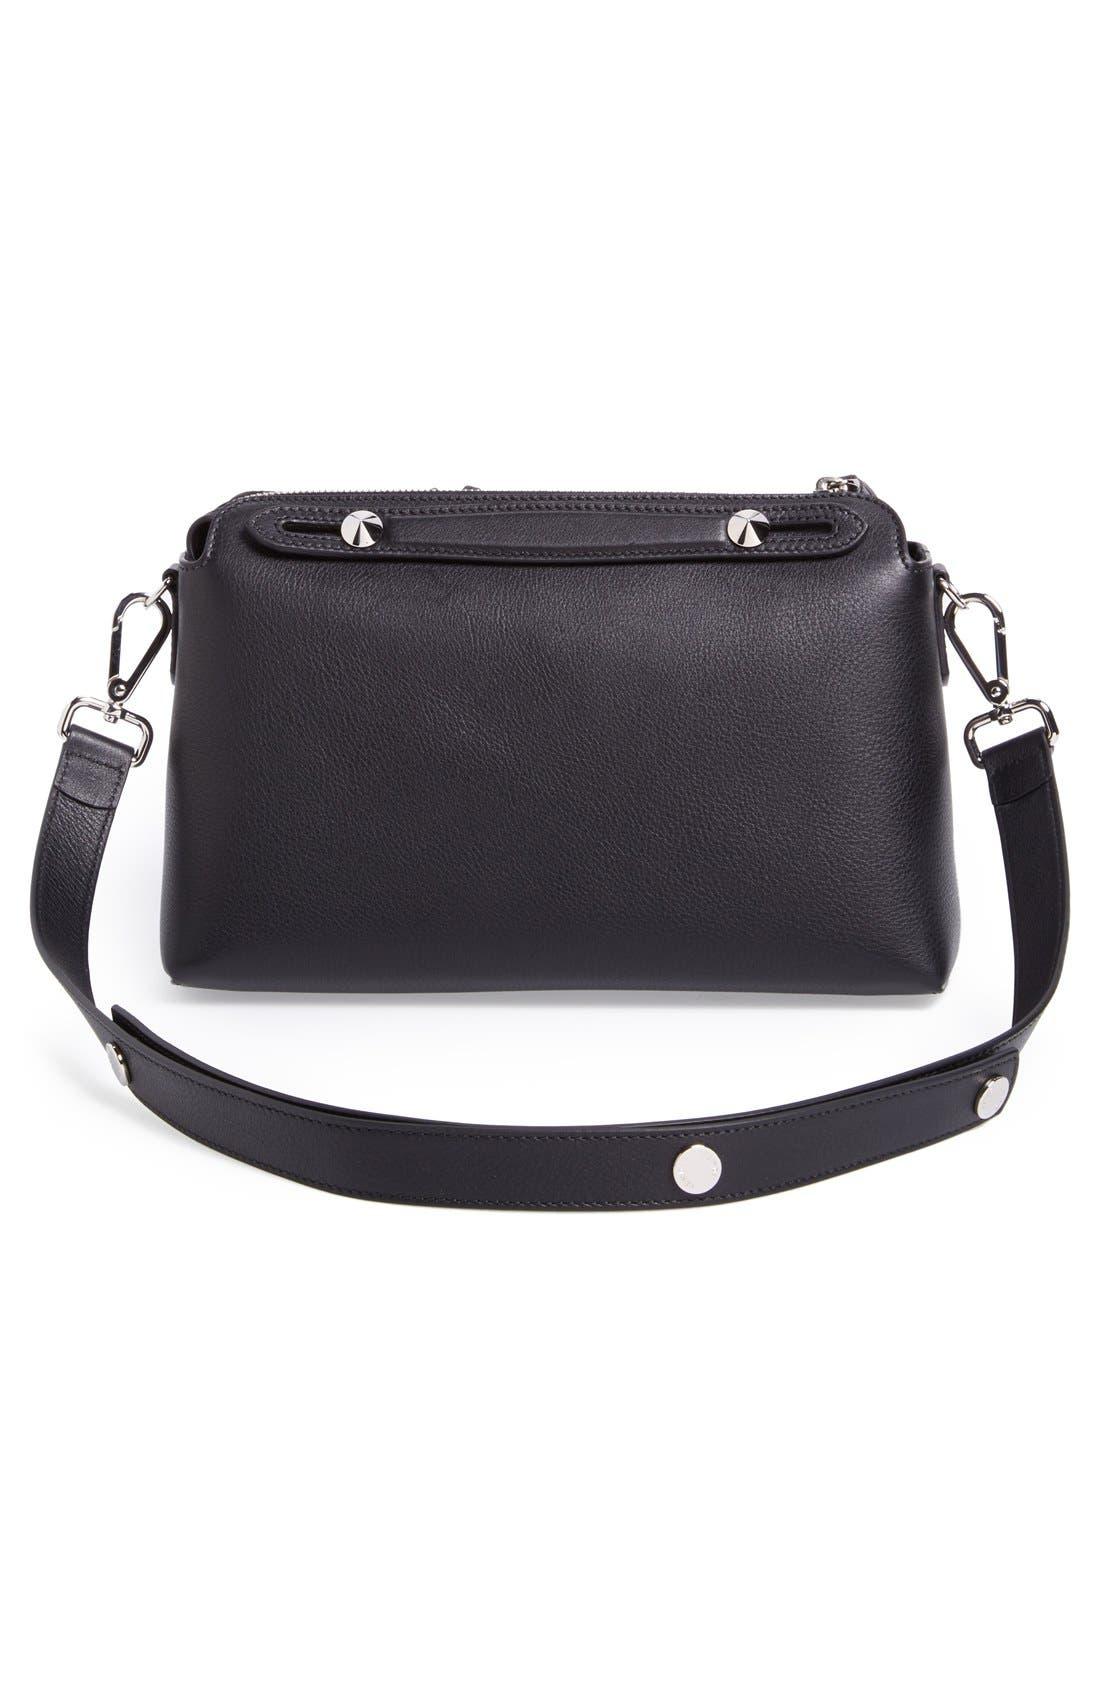 Alternate Image 3  - Fendi 'Bauletto Piccolo' Leather Crossbody Bag